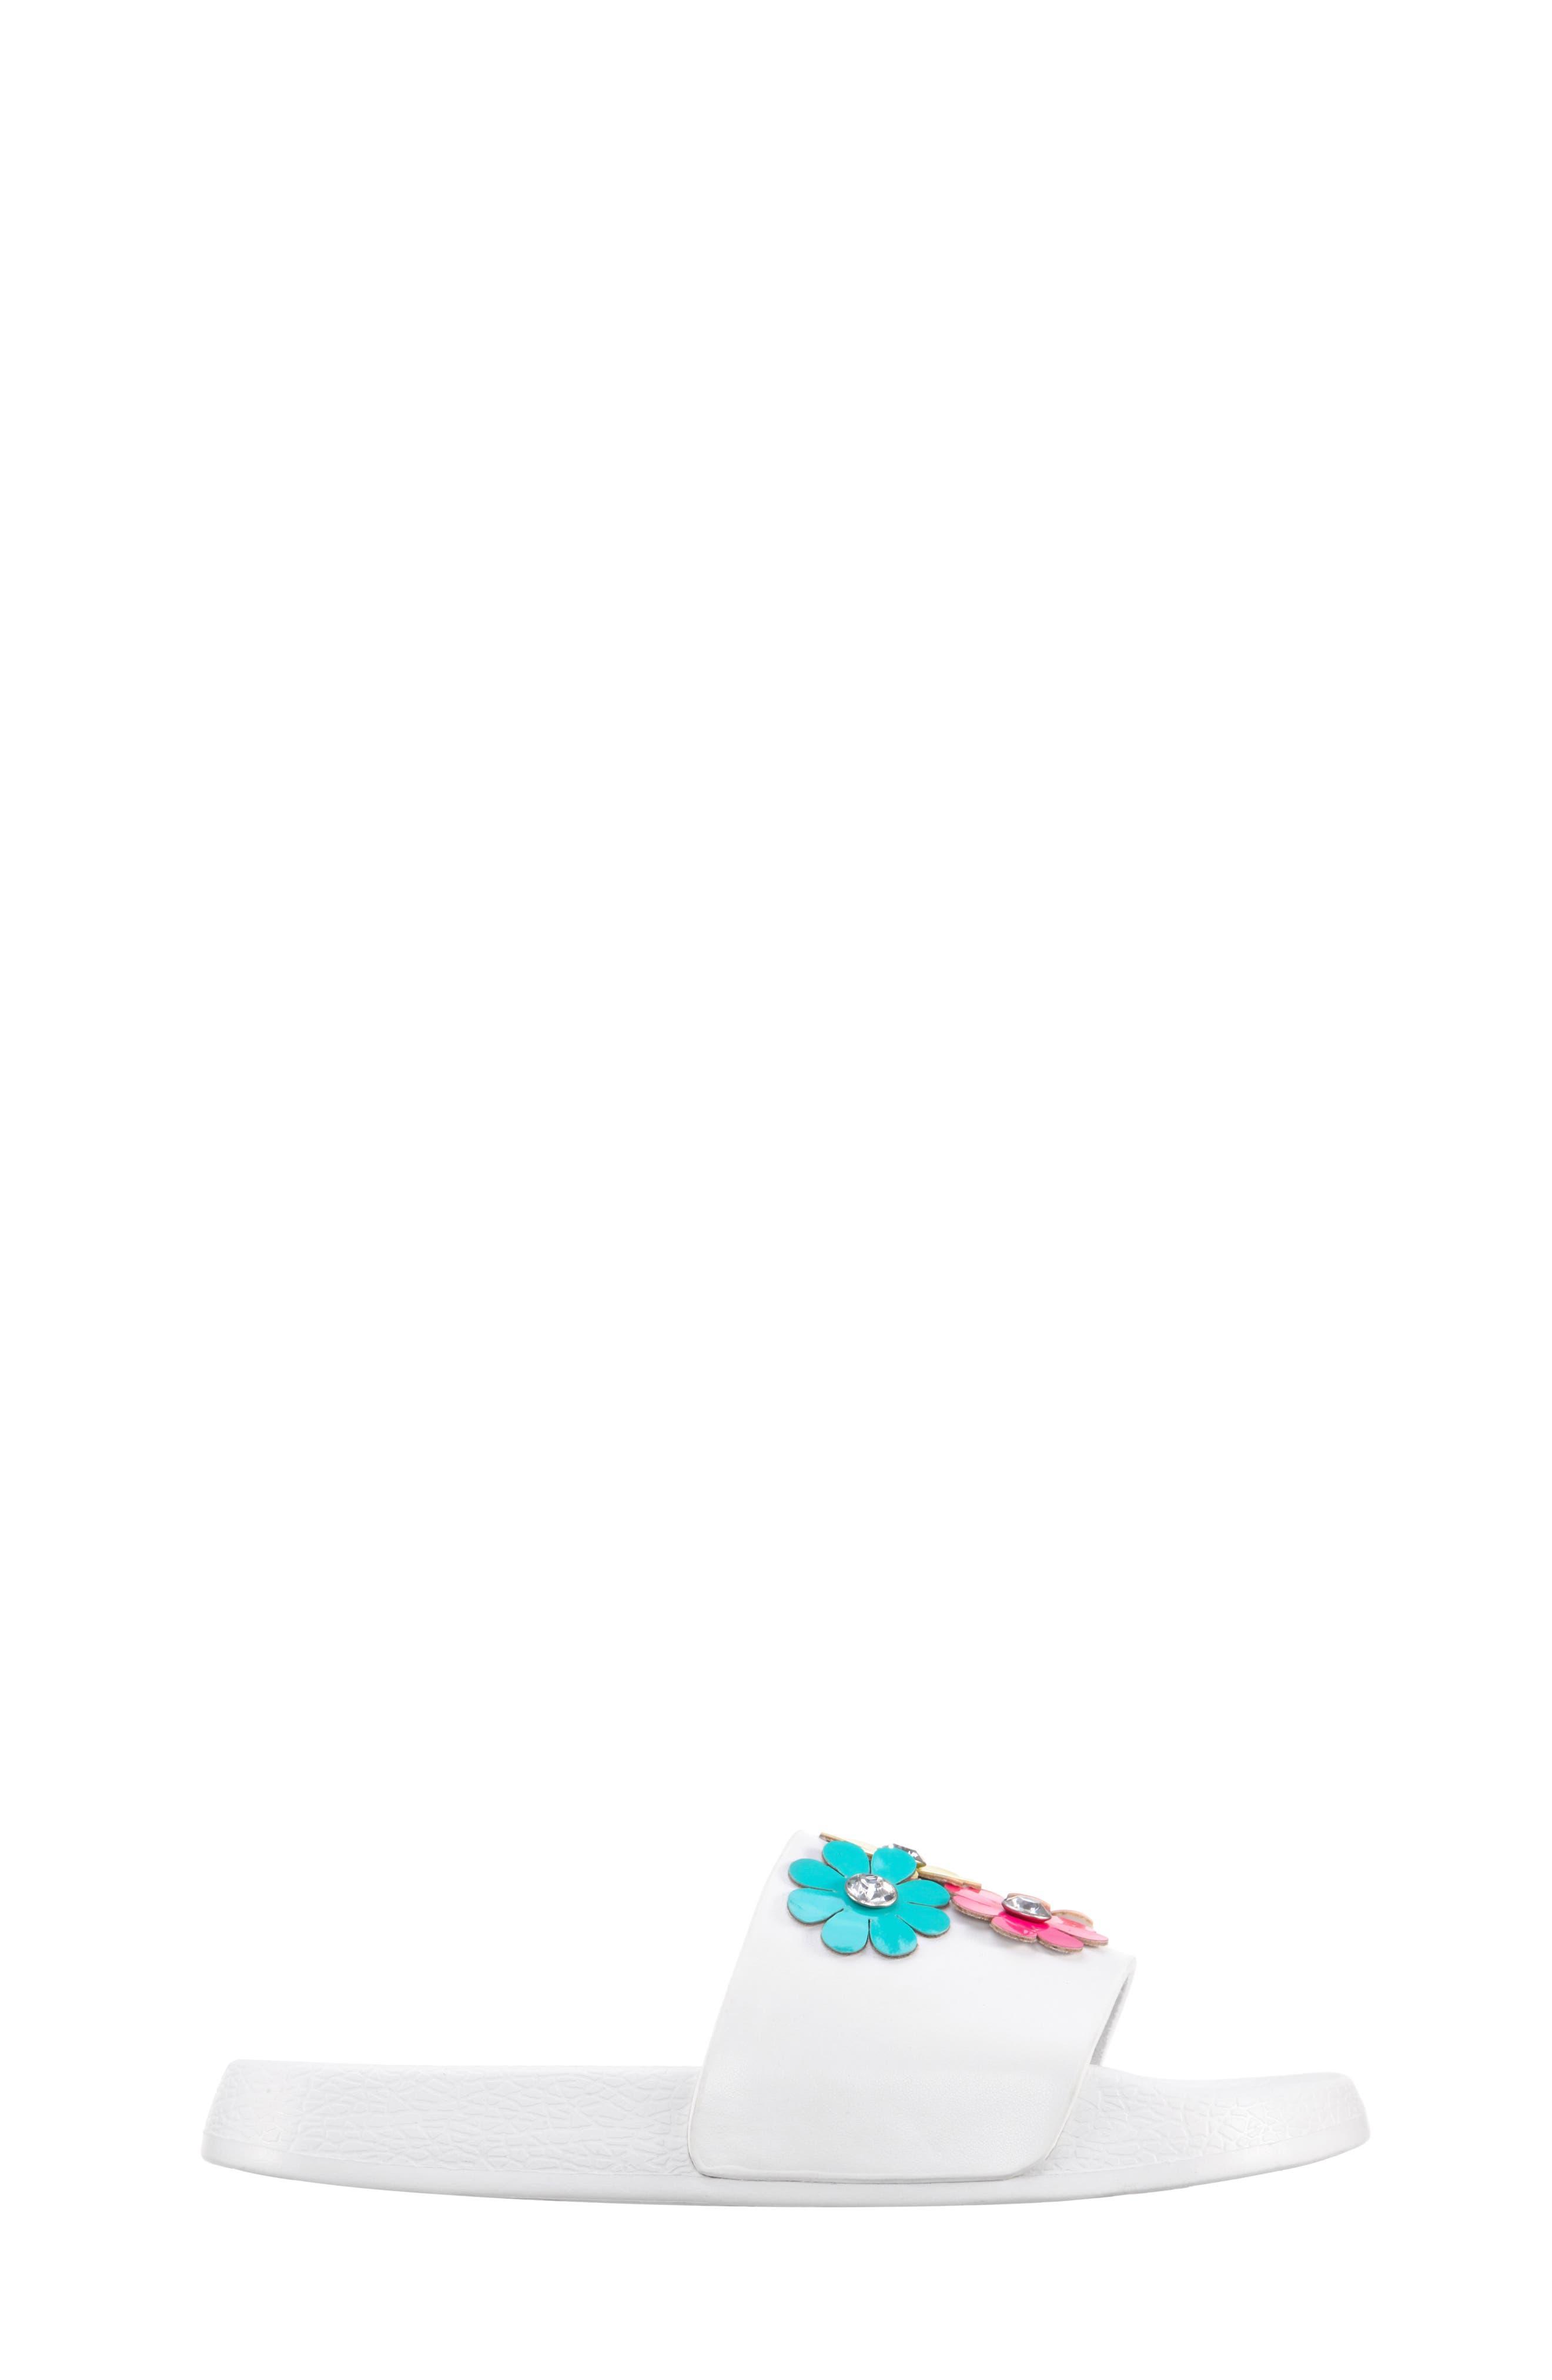 Flowermaid Embellished Slide Sandal,                             Alternate thumbnail 2, color,                             White Smooth